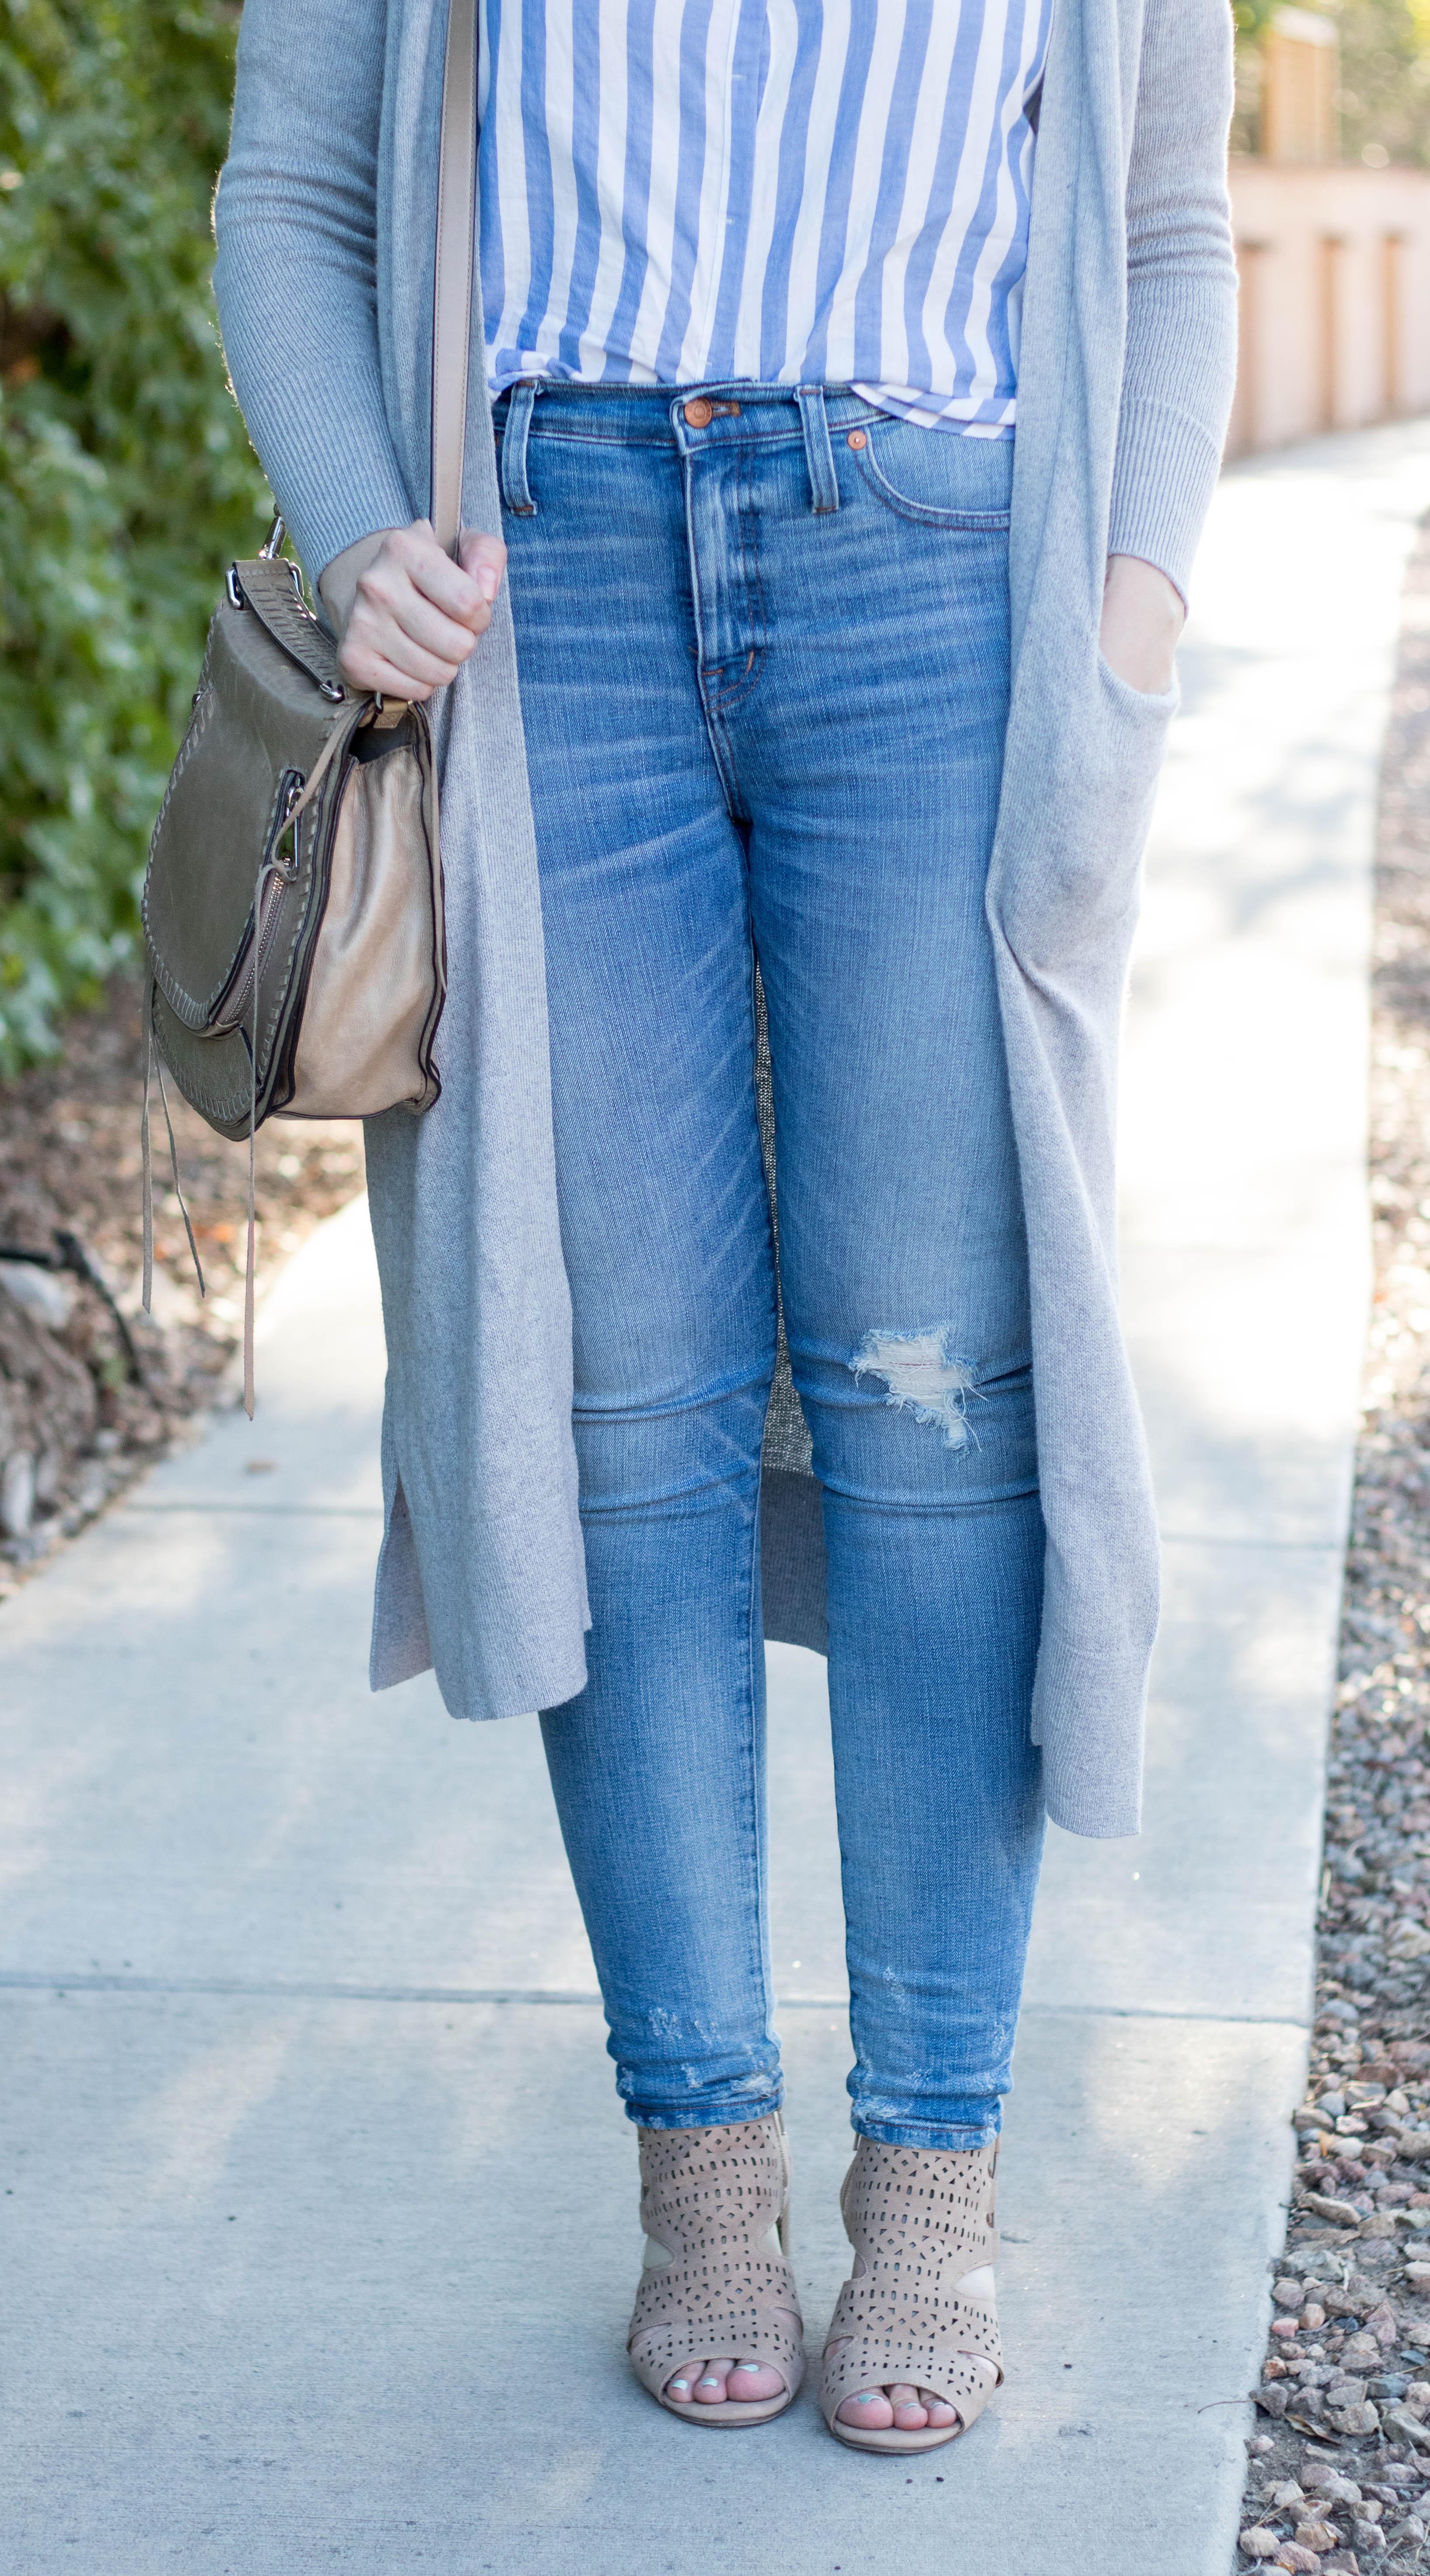 madewell high rise skinny Jeans #madewell #everydaymadewell #tallfashion #jeans